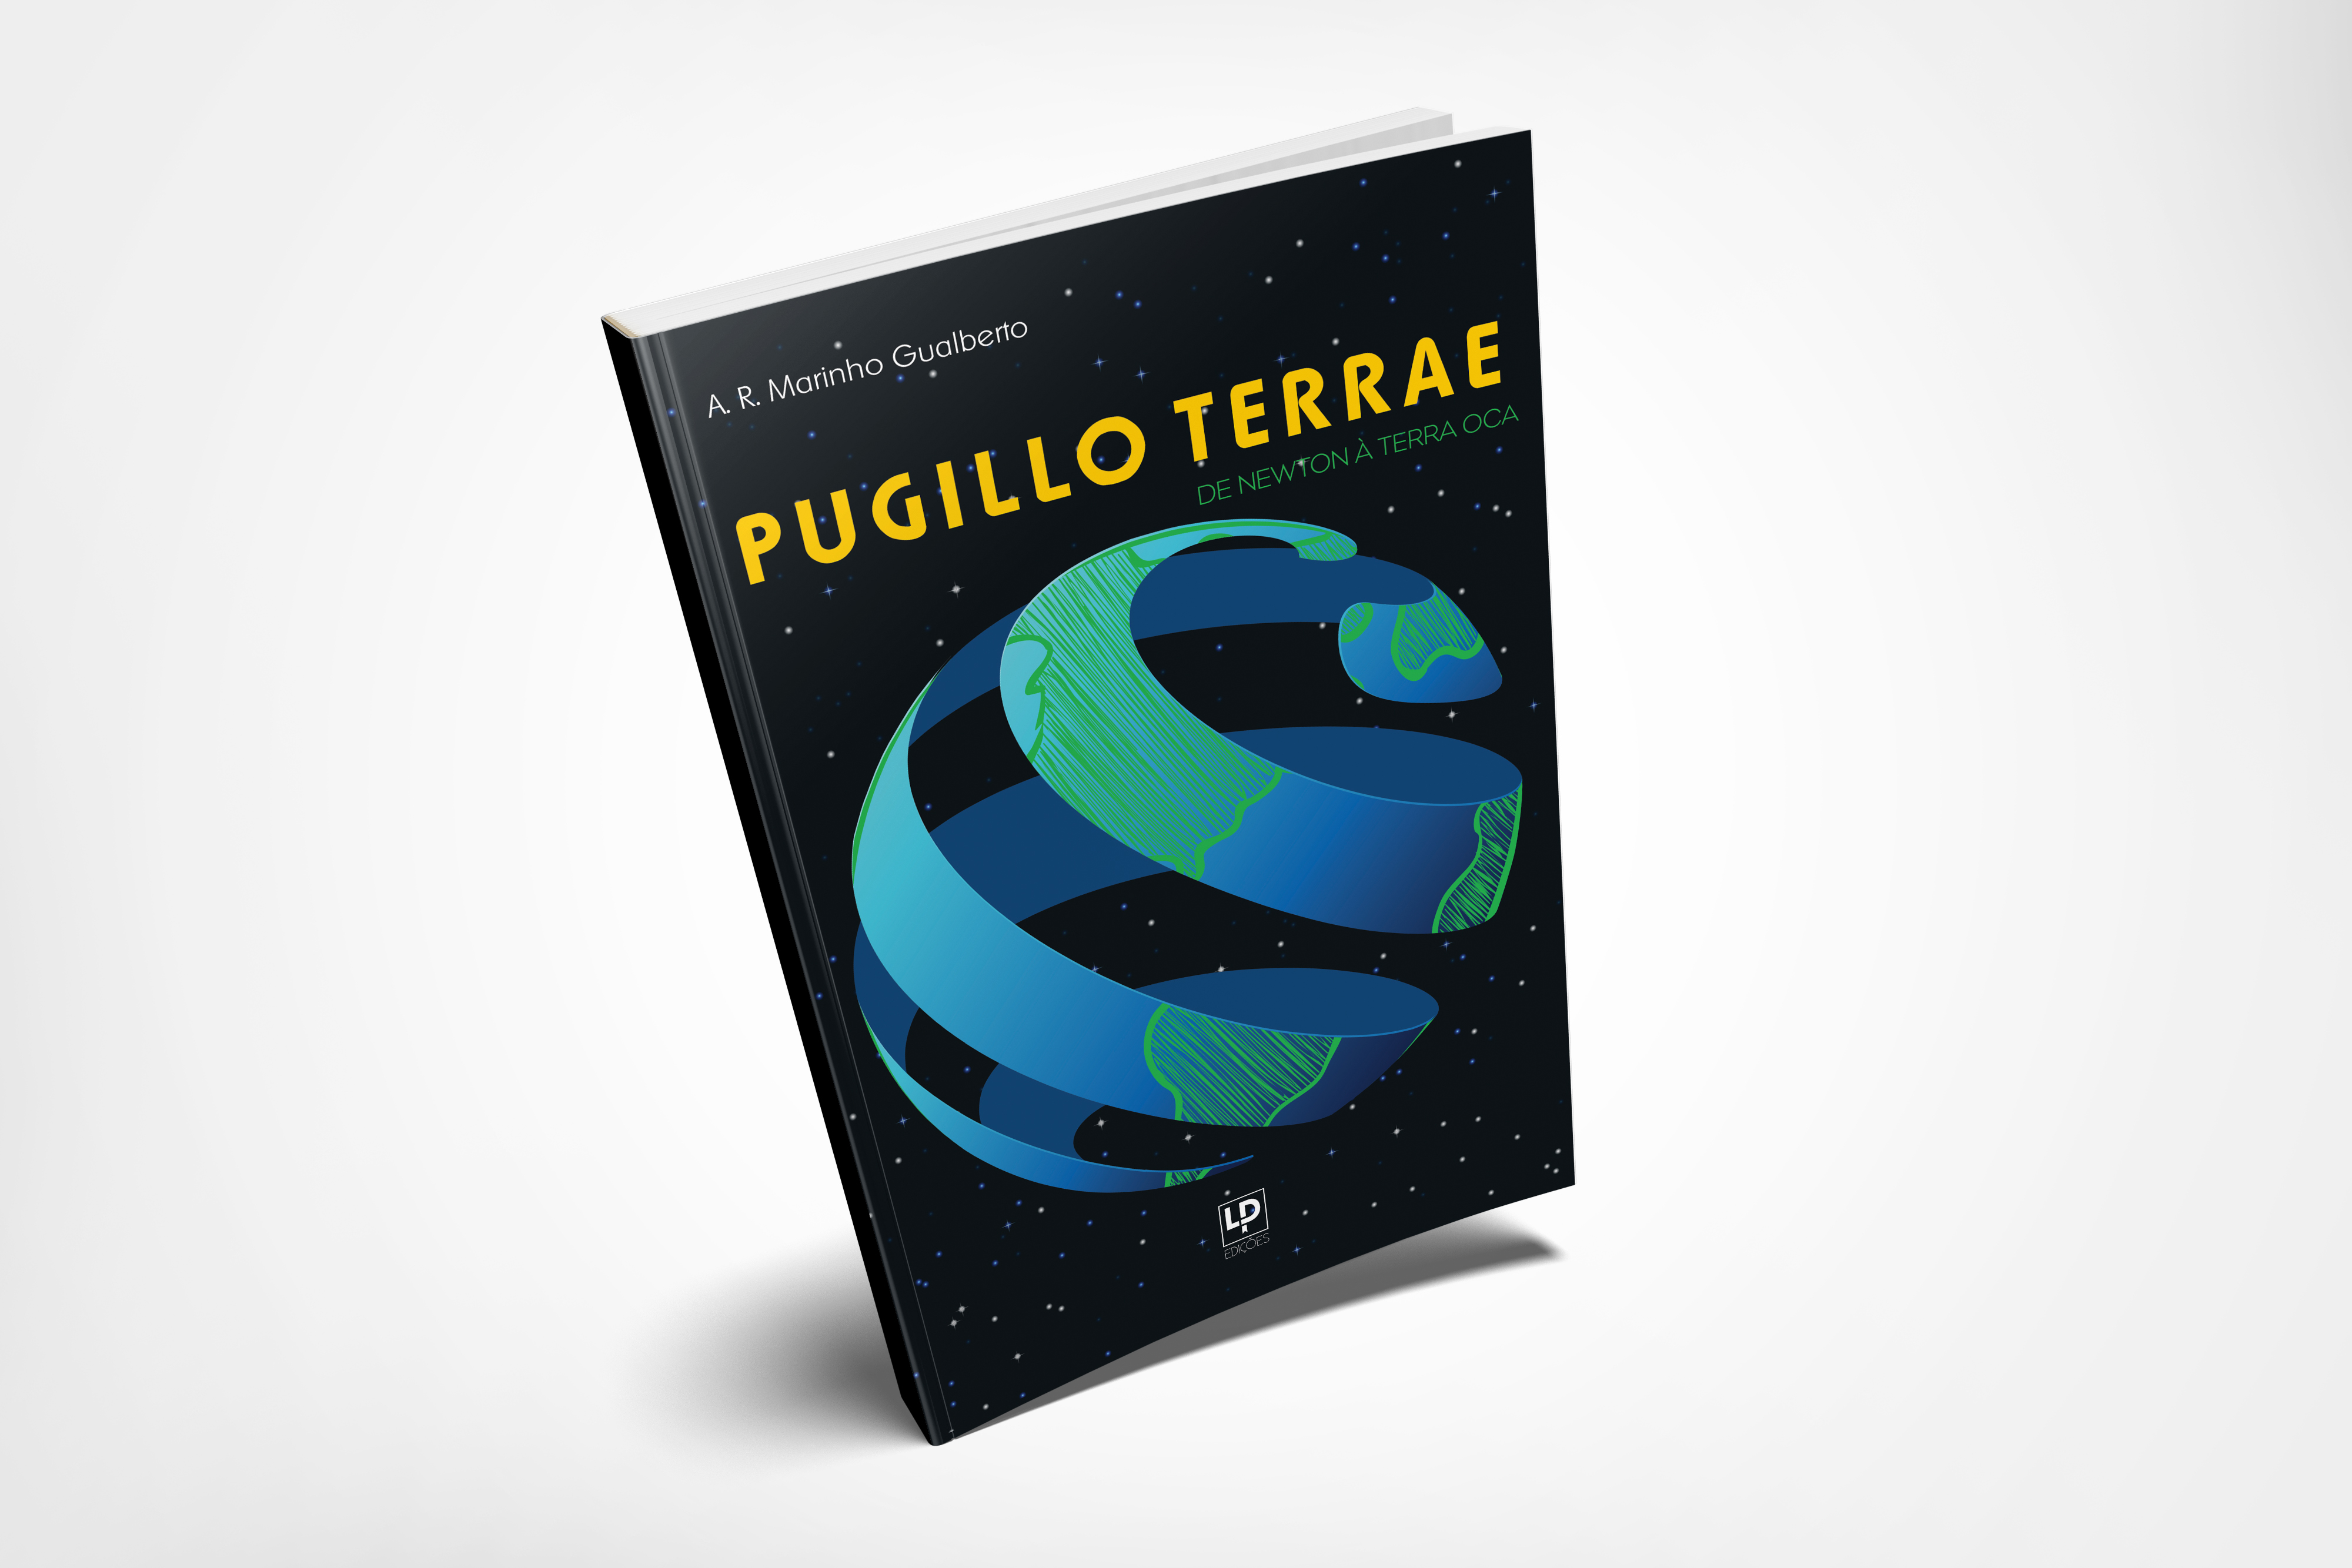 Capa livro pugillo_terrae-16x23